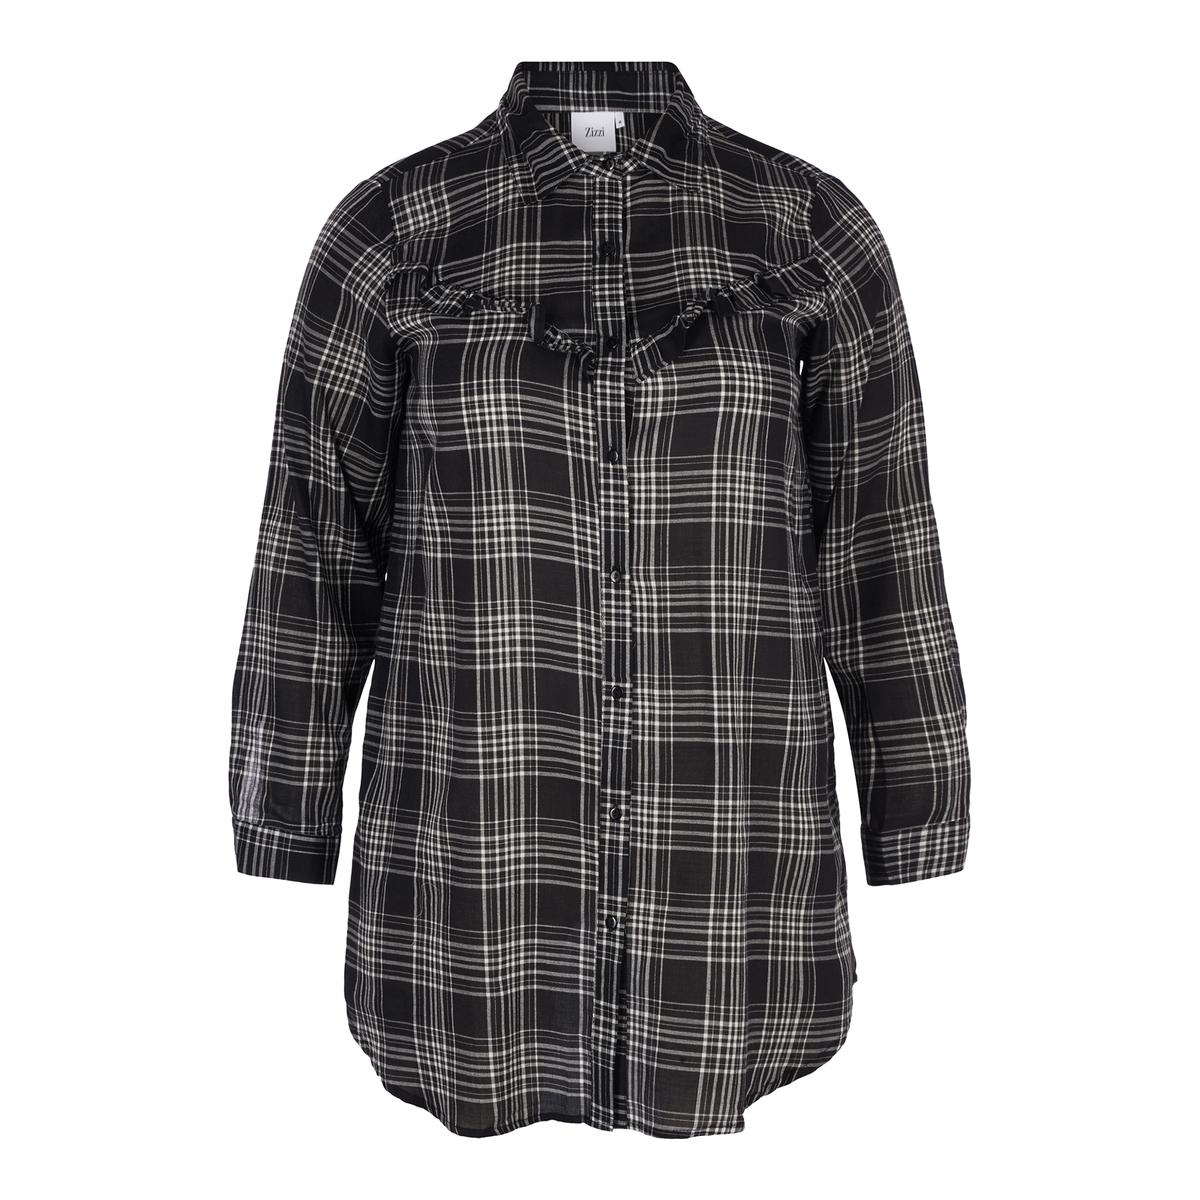 Рубашка с длинными рукавами в клетку рубашка в клетку rip curl faded check shirt indian teal